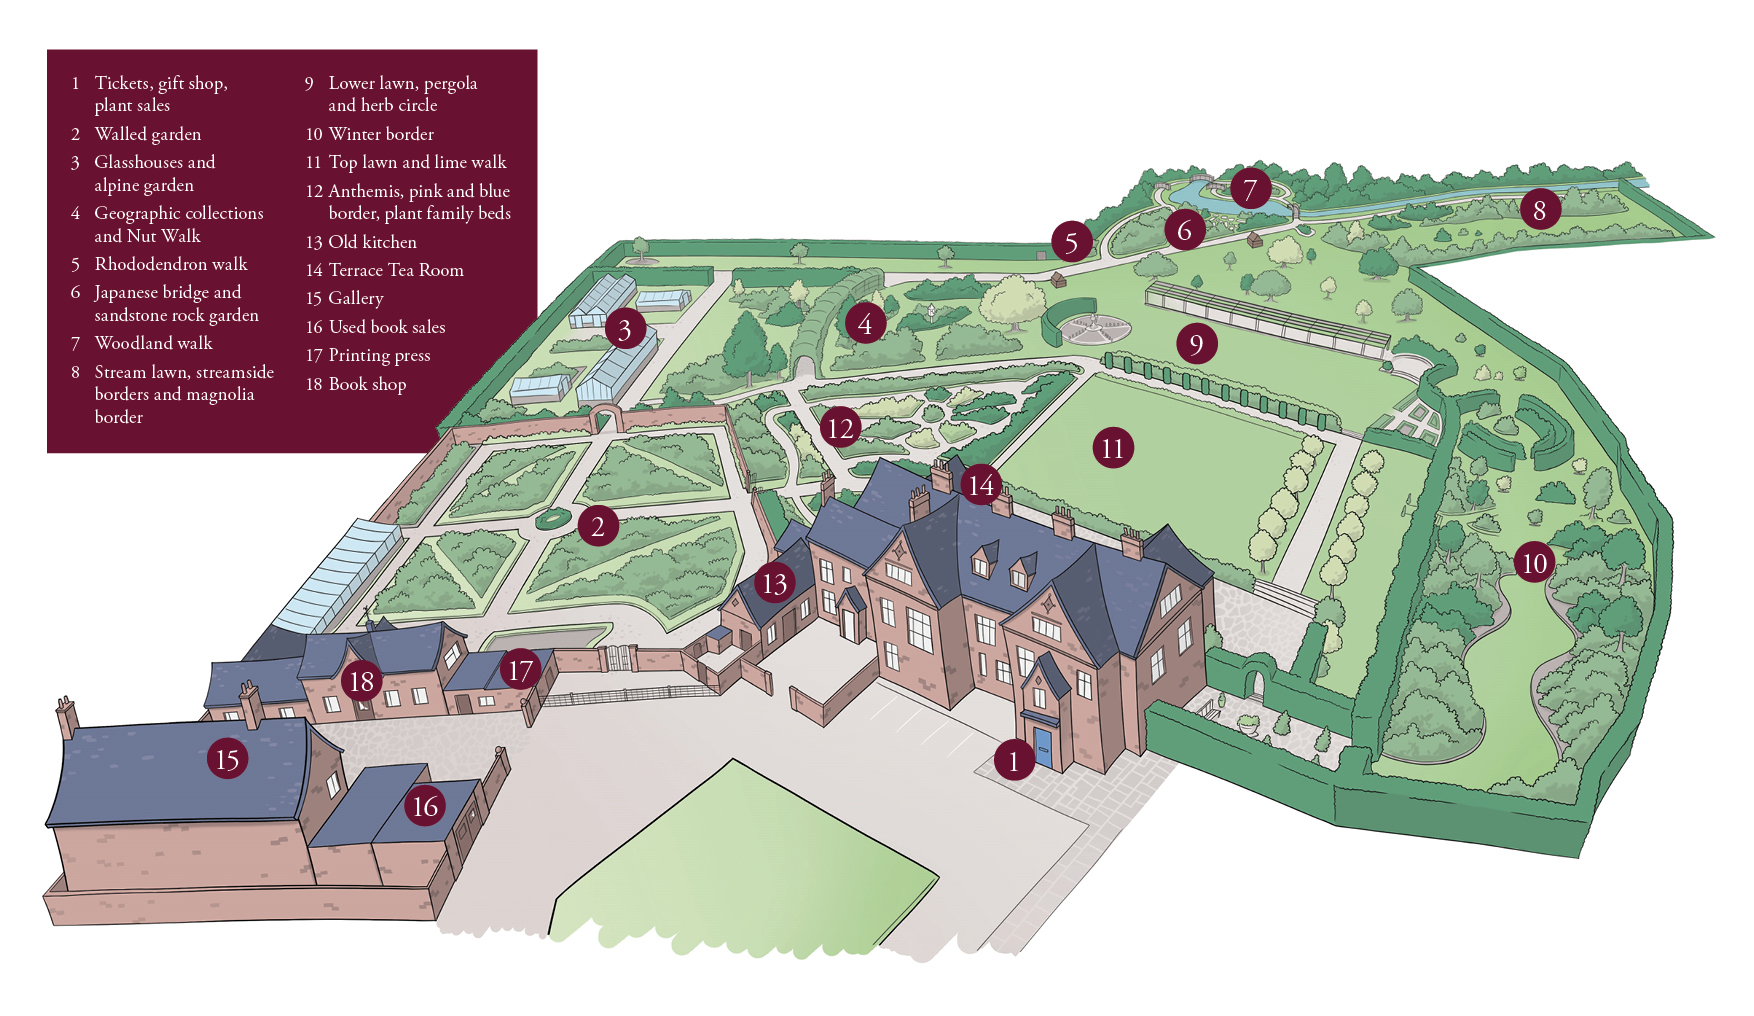 House Garden Map >> Map Of Winterbourne House Garden